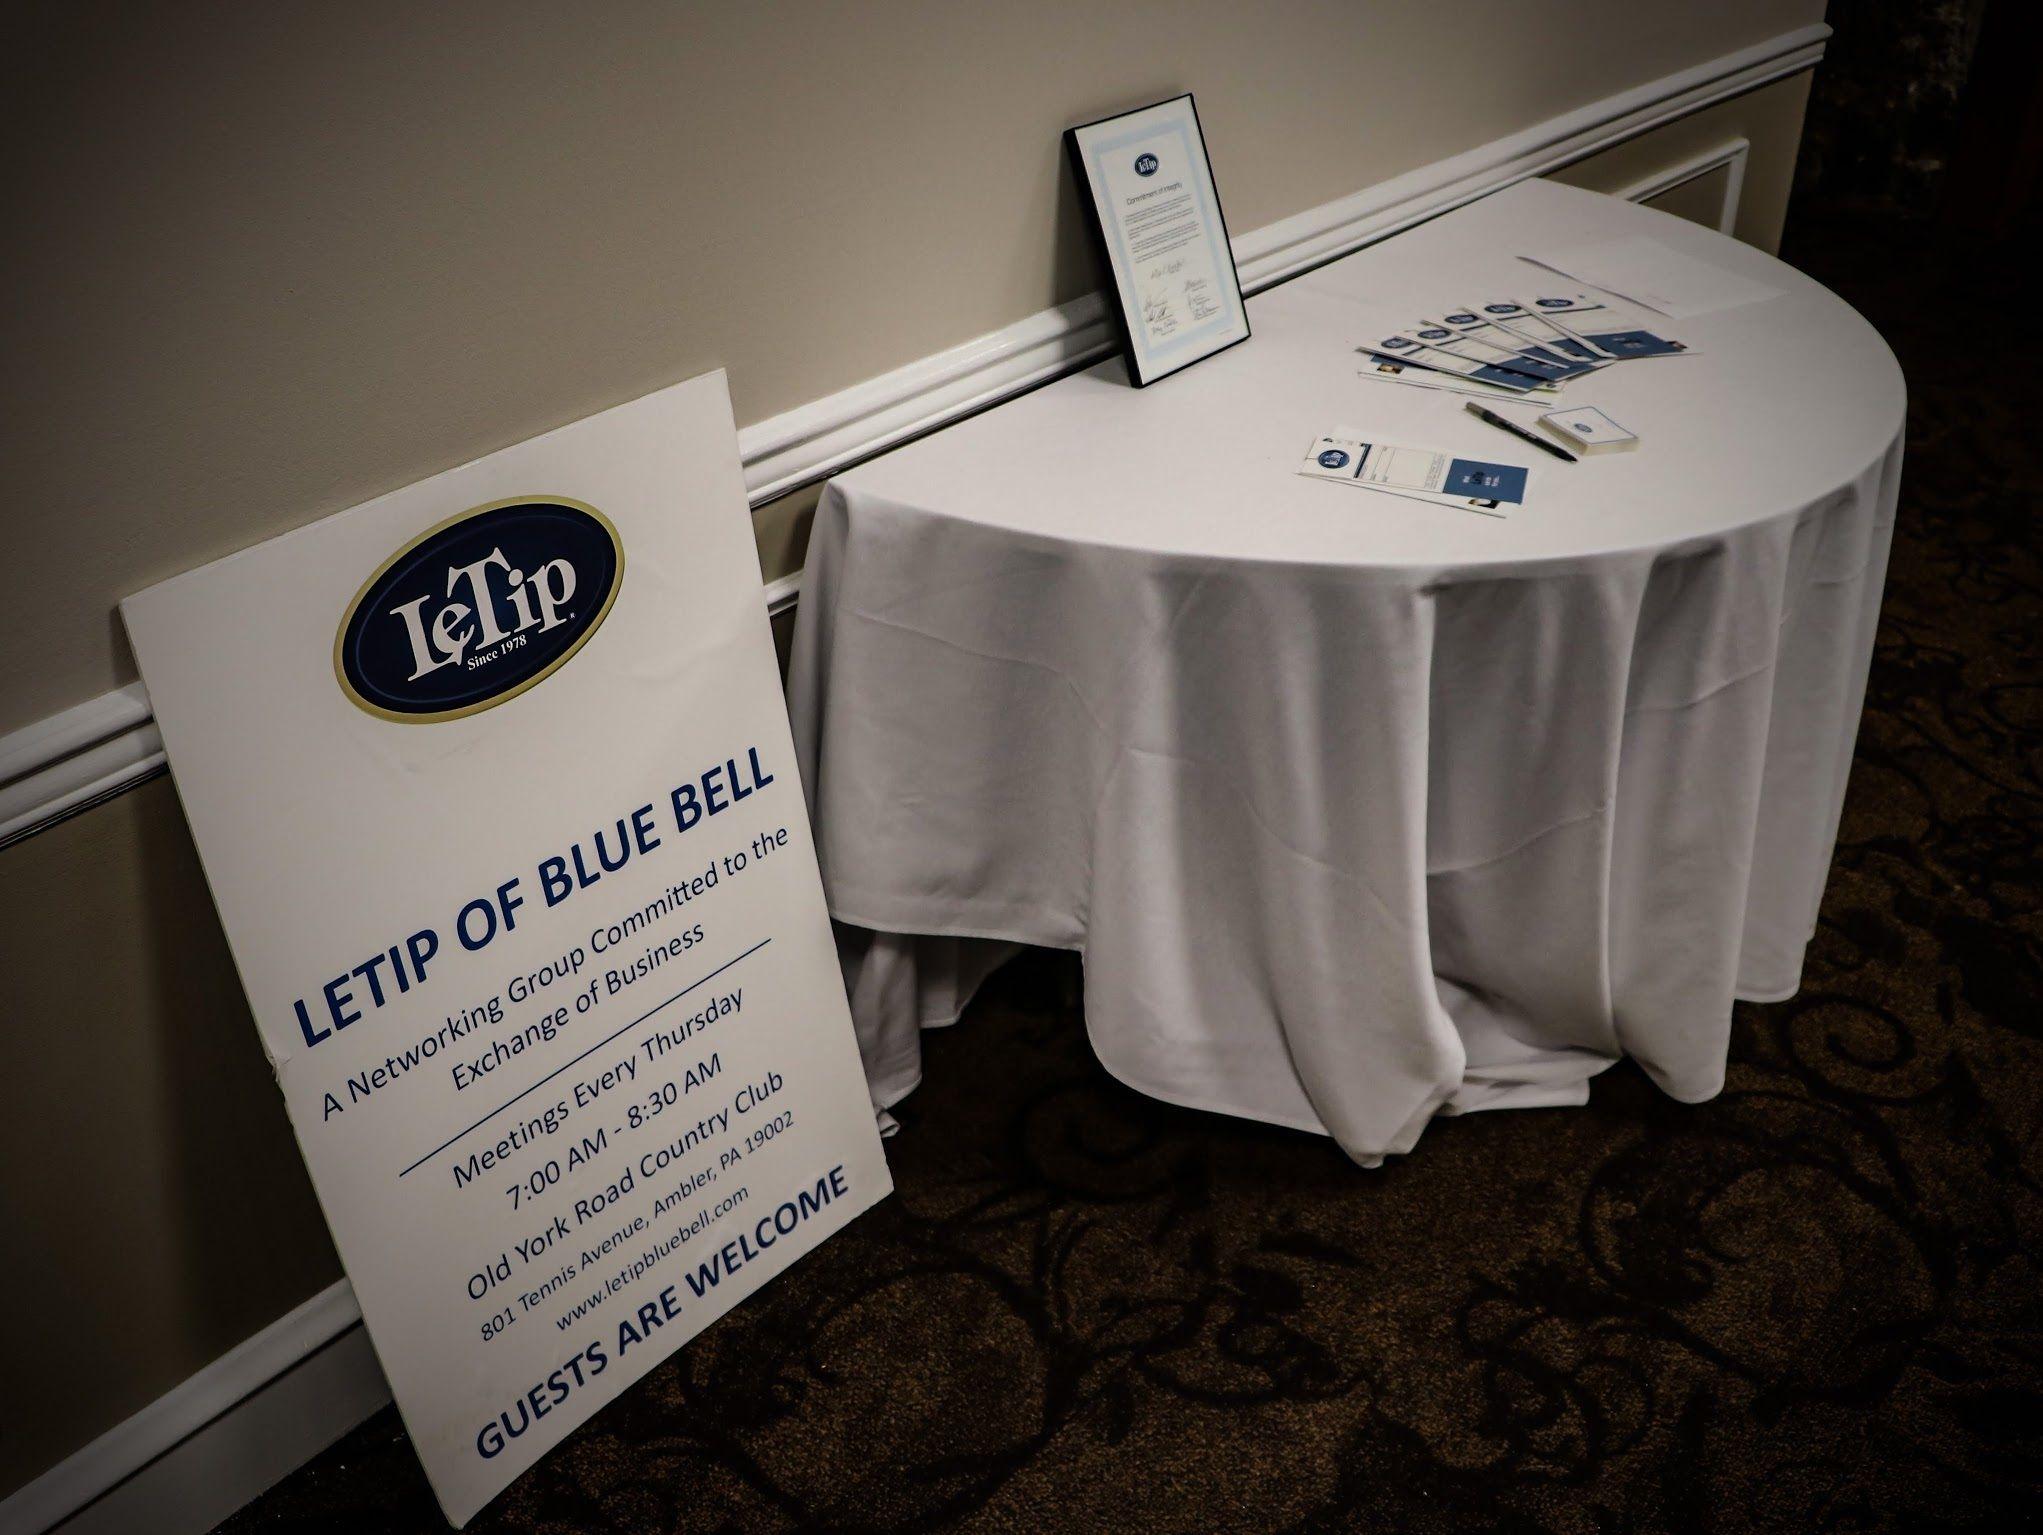 LeTip Blue Bell - Business Networking Meetup